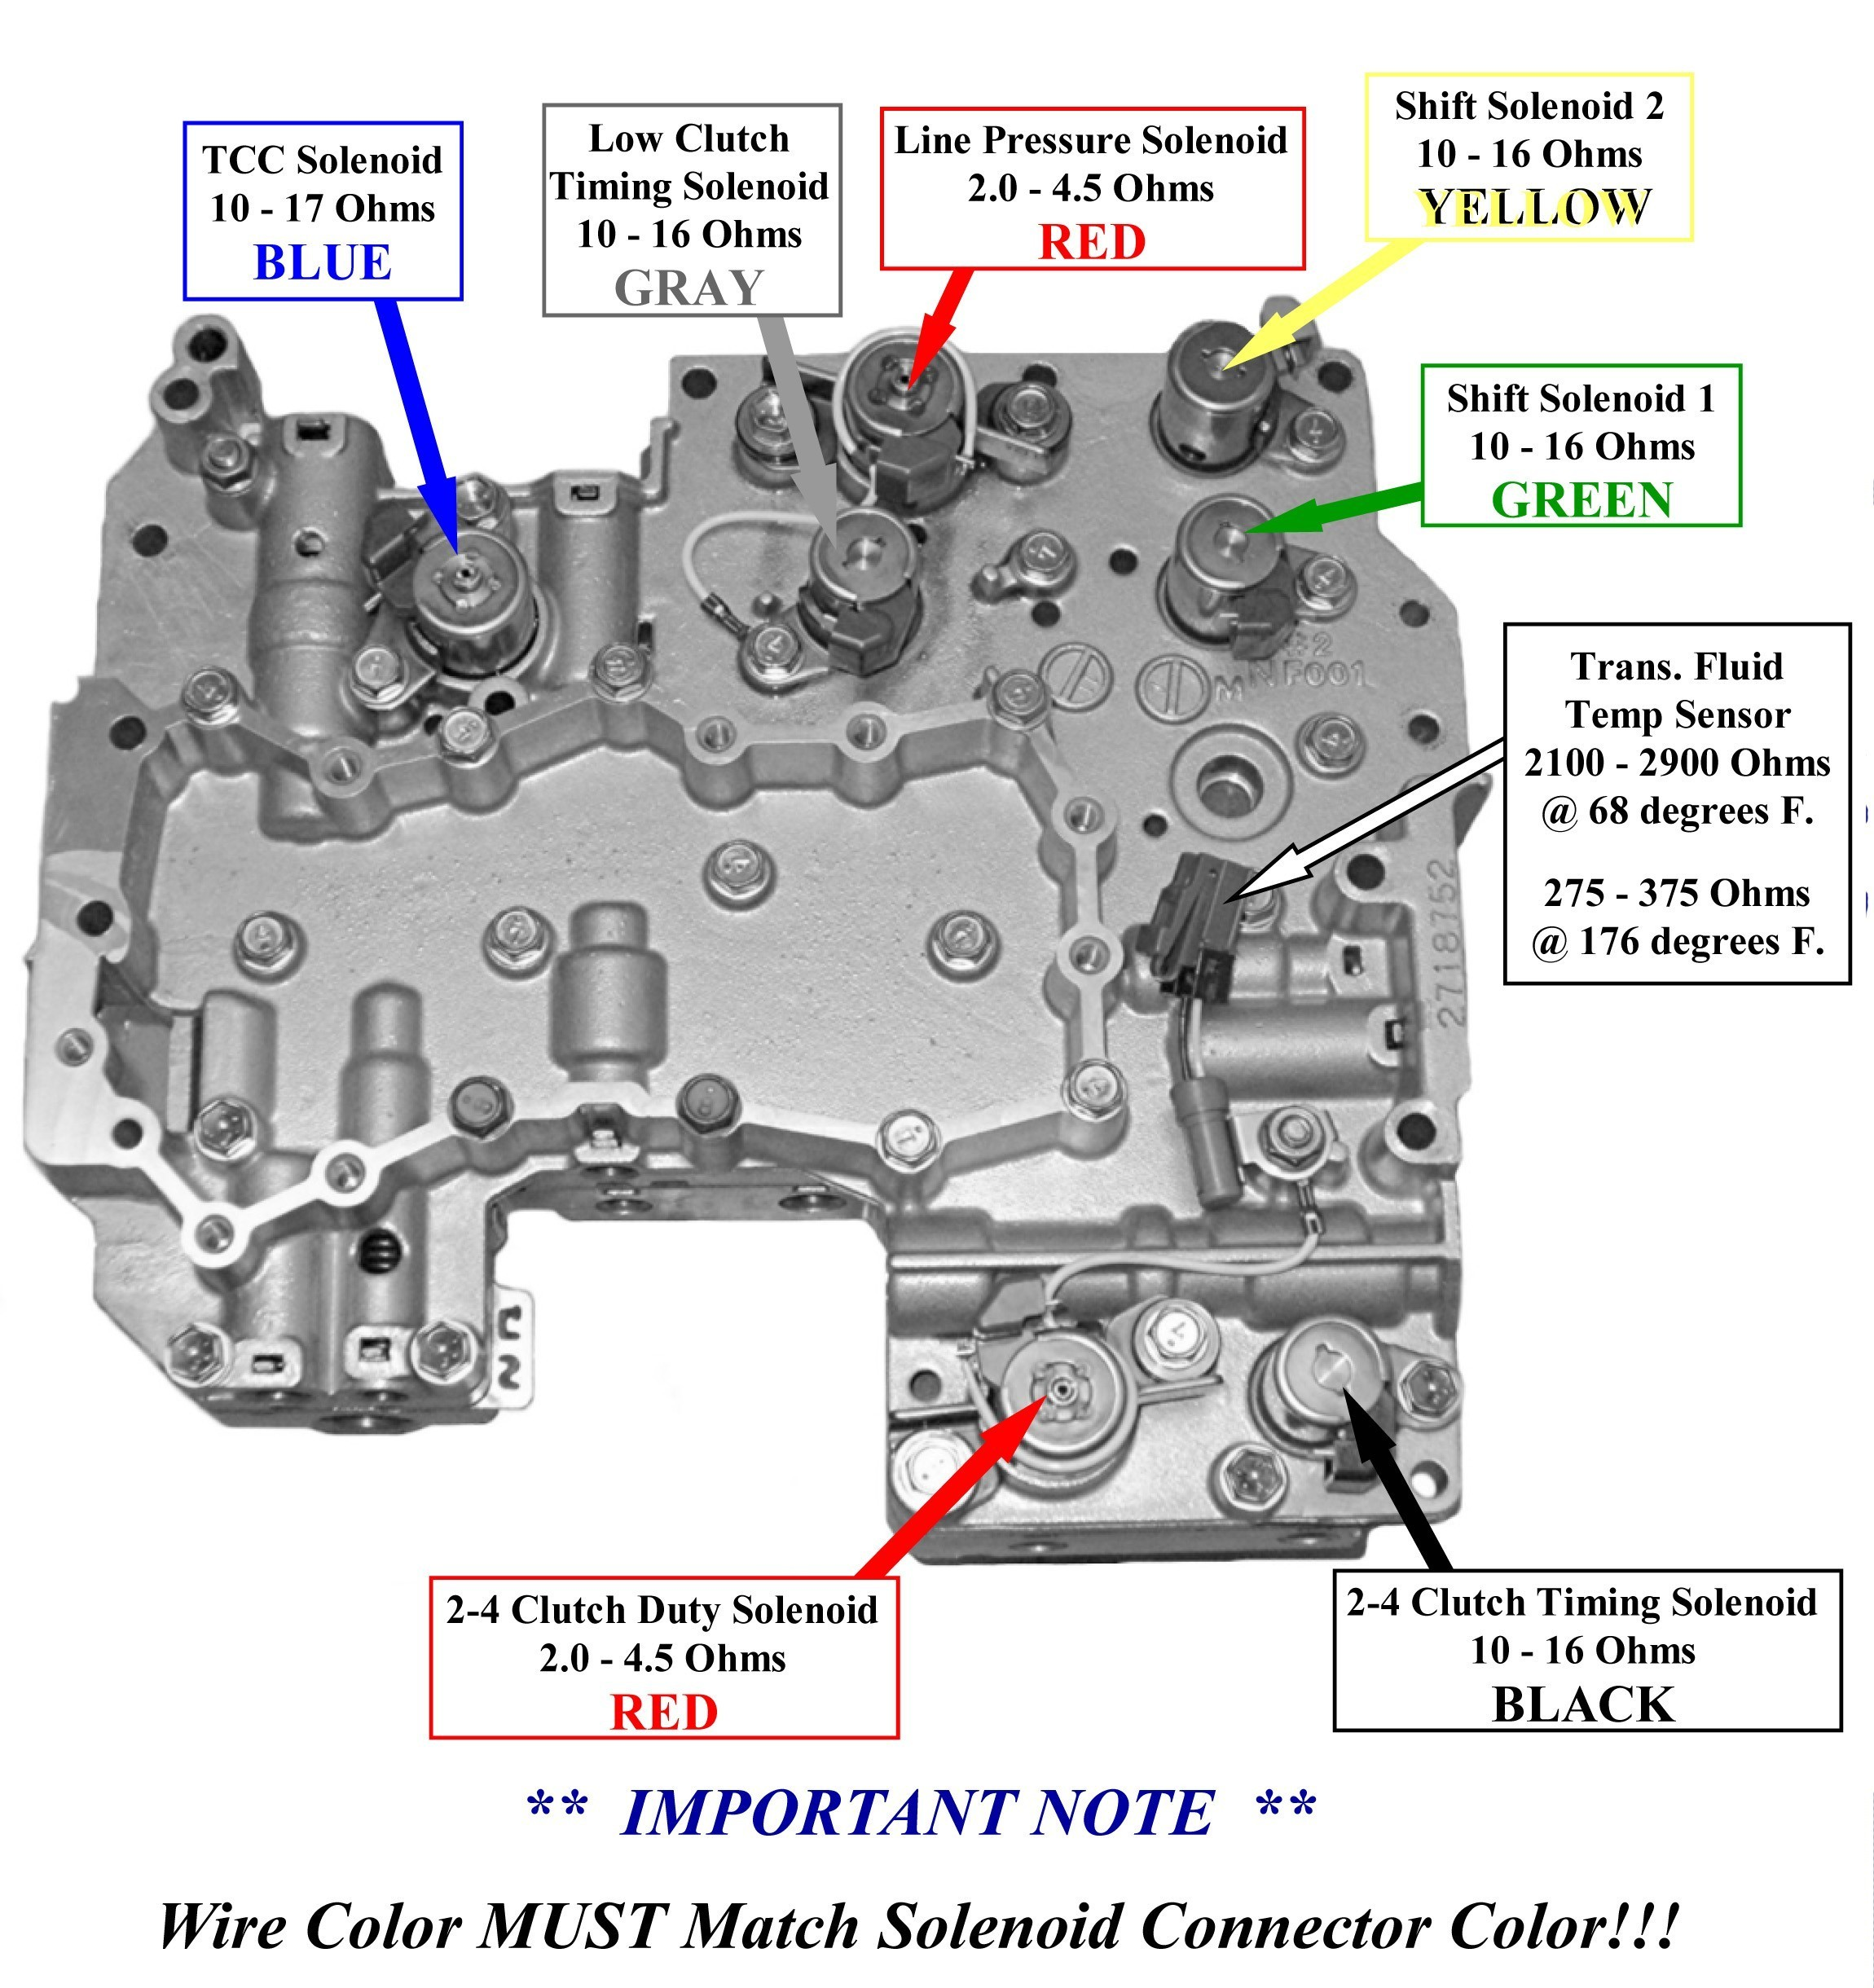 2001 Subaru Outback Engine Diagram 2001 Subaru Outback Parts Diagram 2002 Subaru  Outback Parts Diagram Of